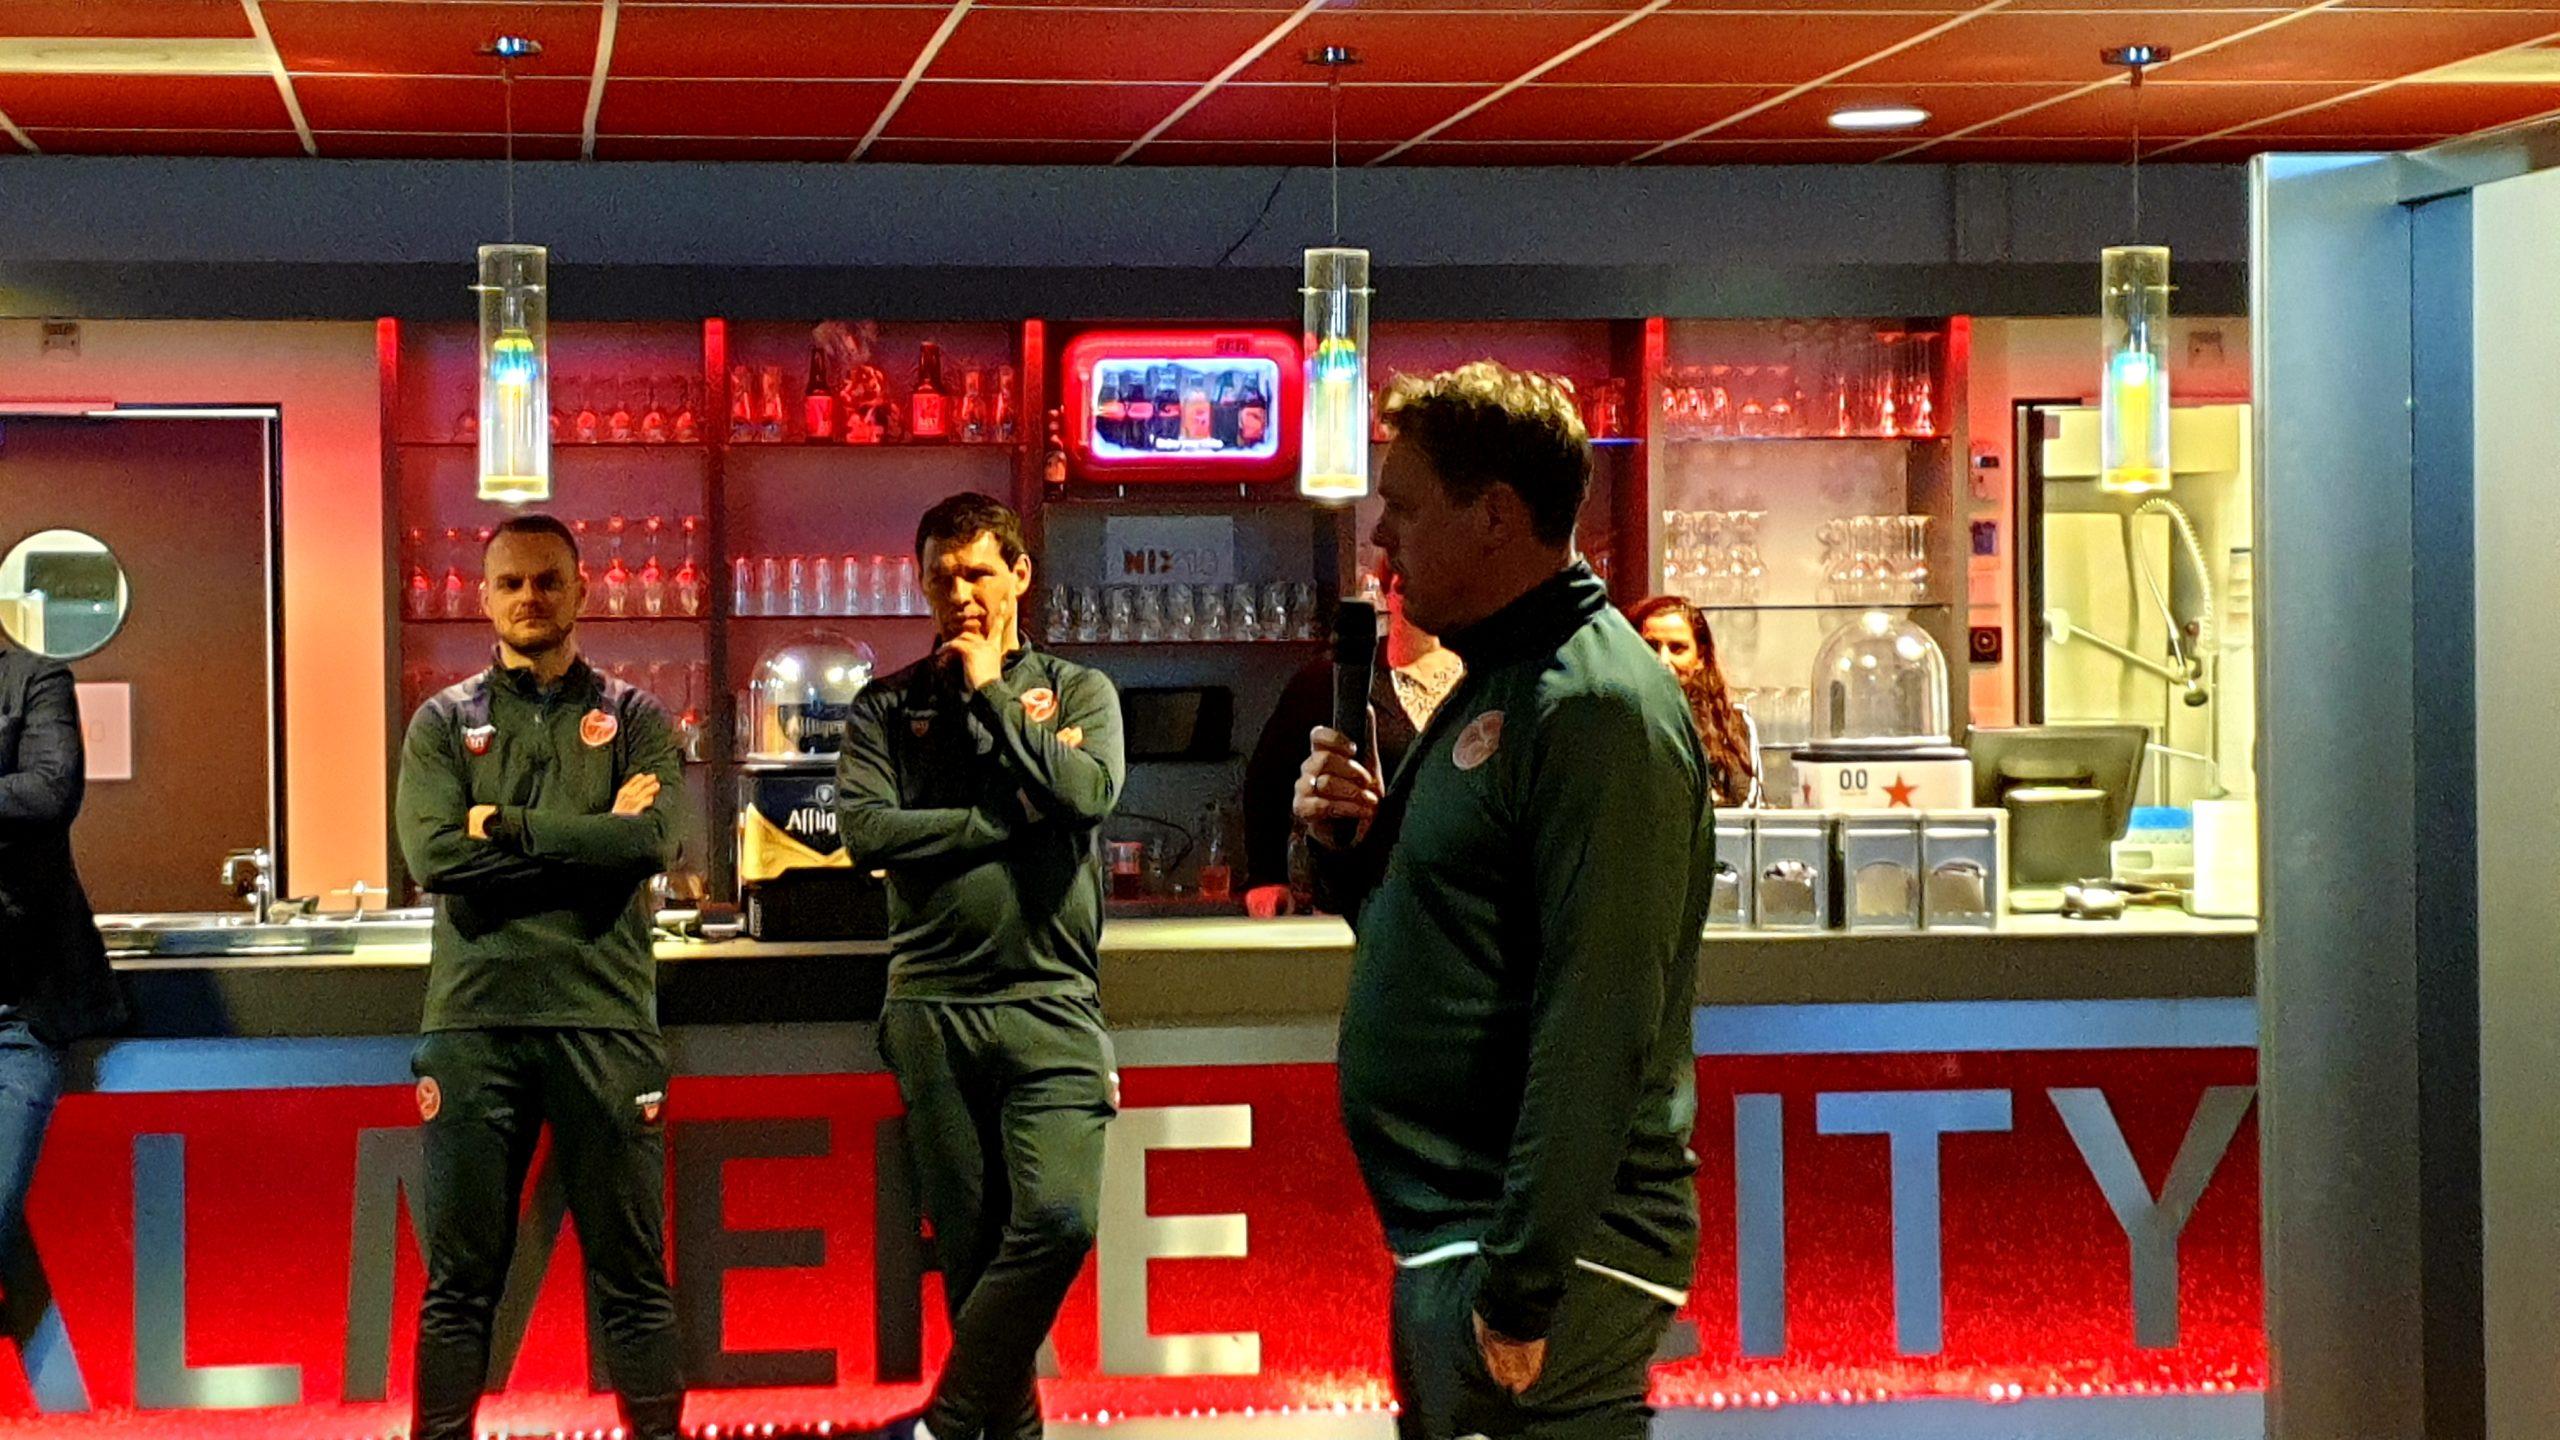 Ambassadeursavond: Nieuw scorebord en dak op academy veld